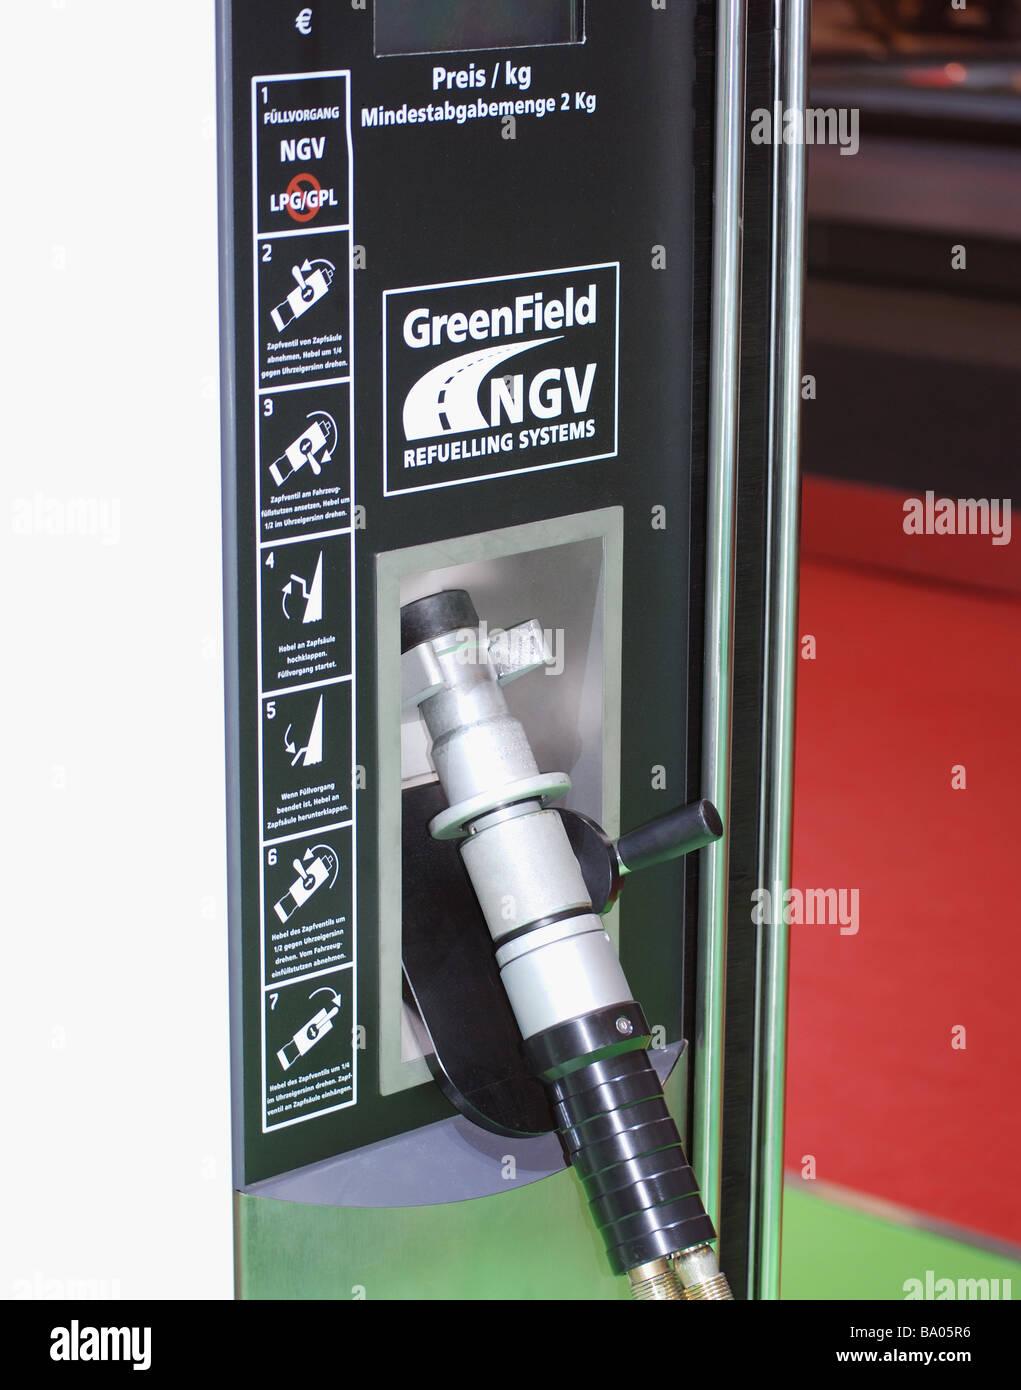 Refuelling equipment for zero emission, alternative fuel hybrid car - Stock Image